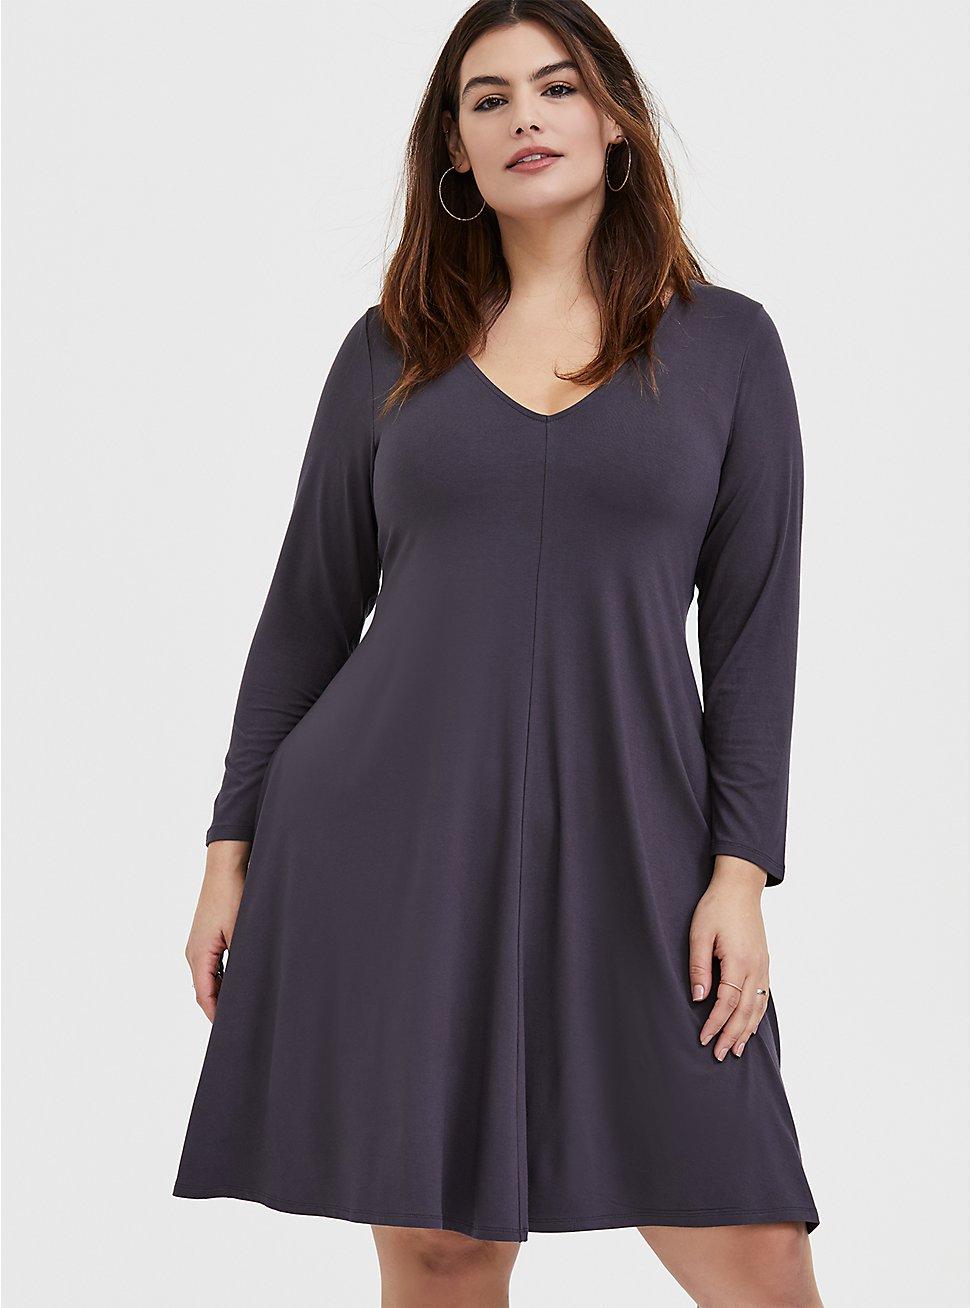 Dark Slate Grey Jersey Trapeze Dress, NINE IRON, hi-res